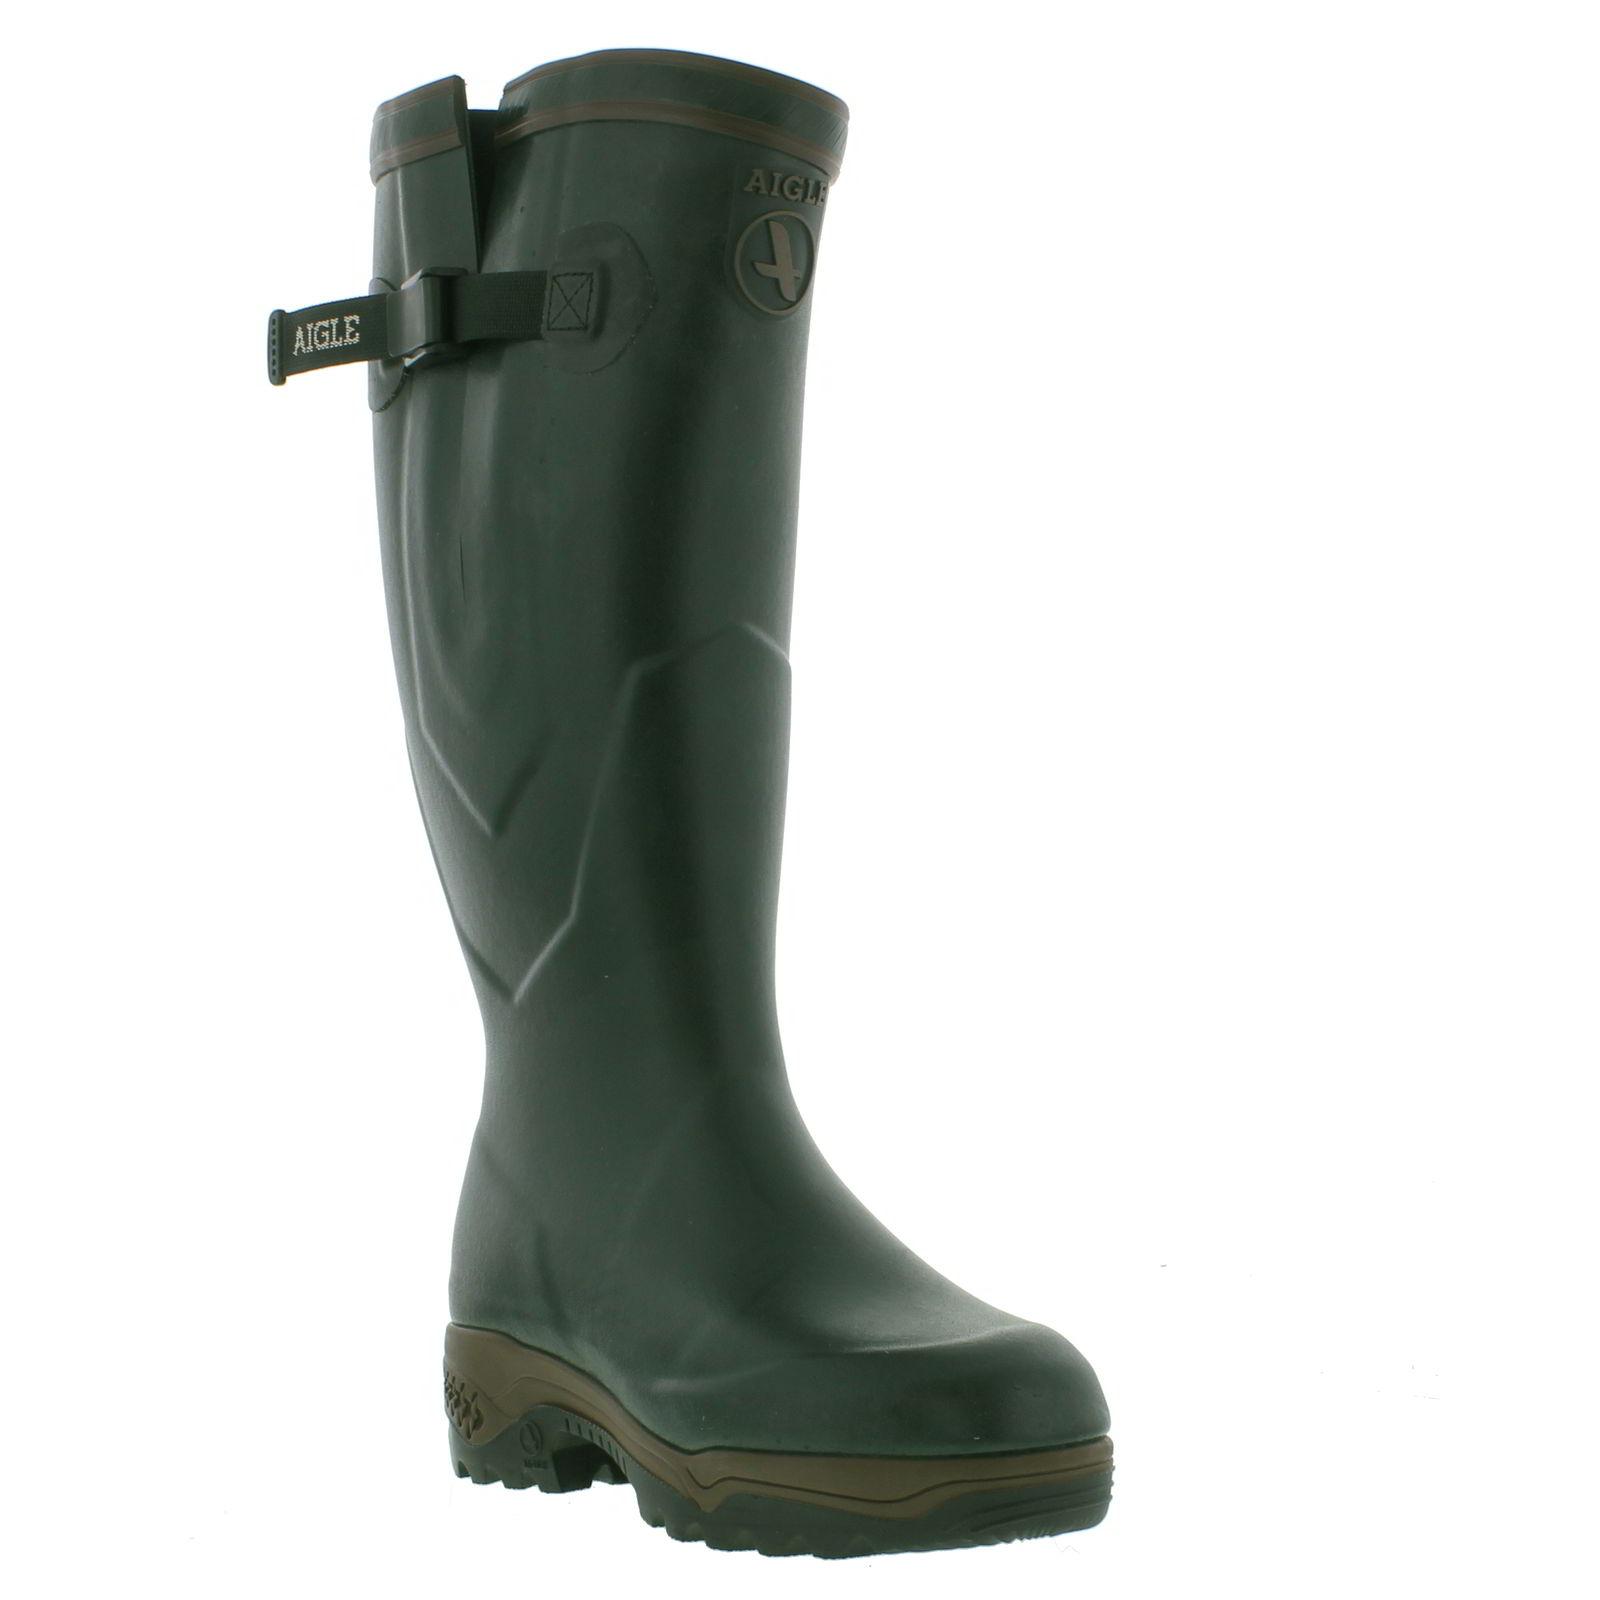 aigle parcours 2 iso wellington mens womens adjustable strap boots size uk 4 11. Black Bedroom Furniture Sets. Home Design Ideas